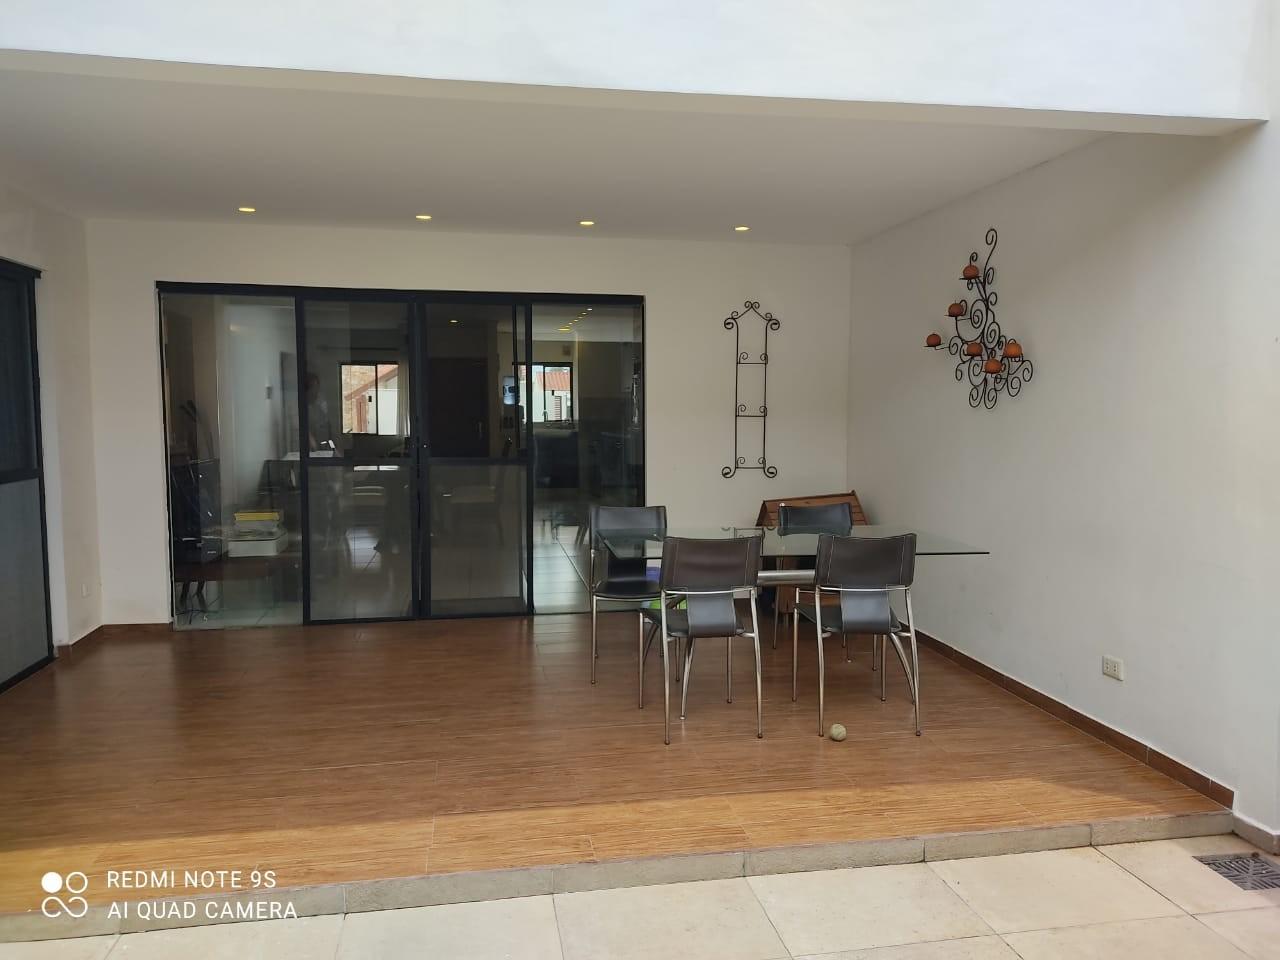 Casa en Venta G77 FONTANA LA RIVIERA 1  Foto 6